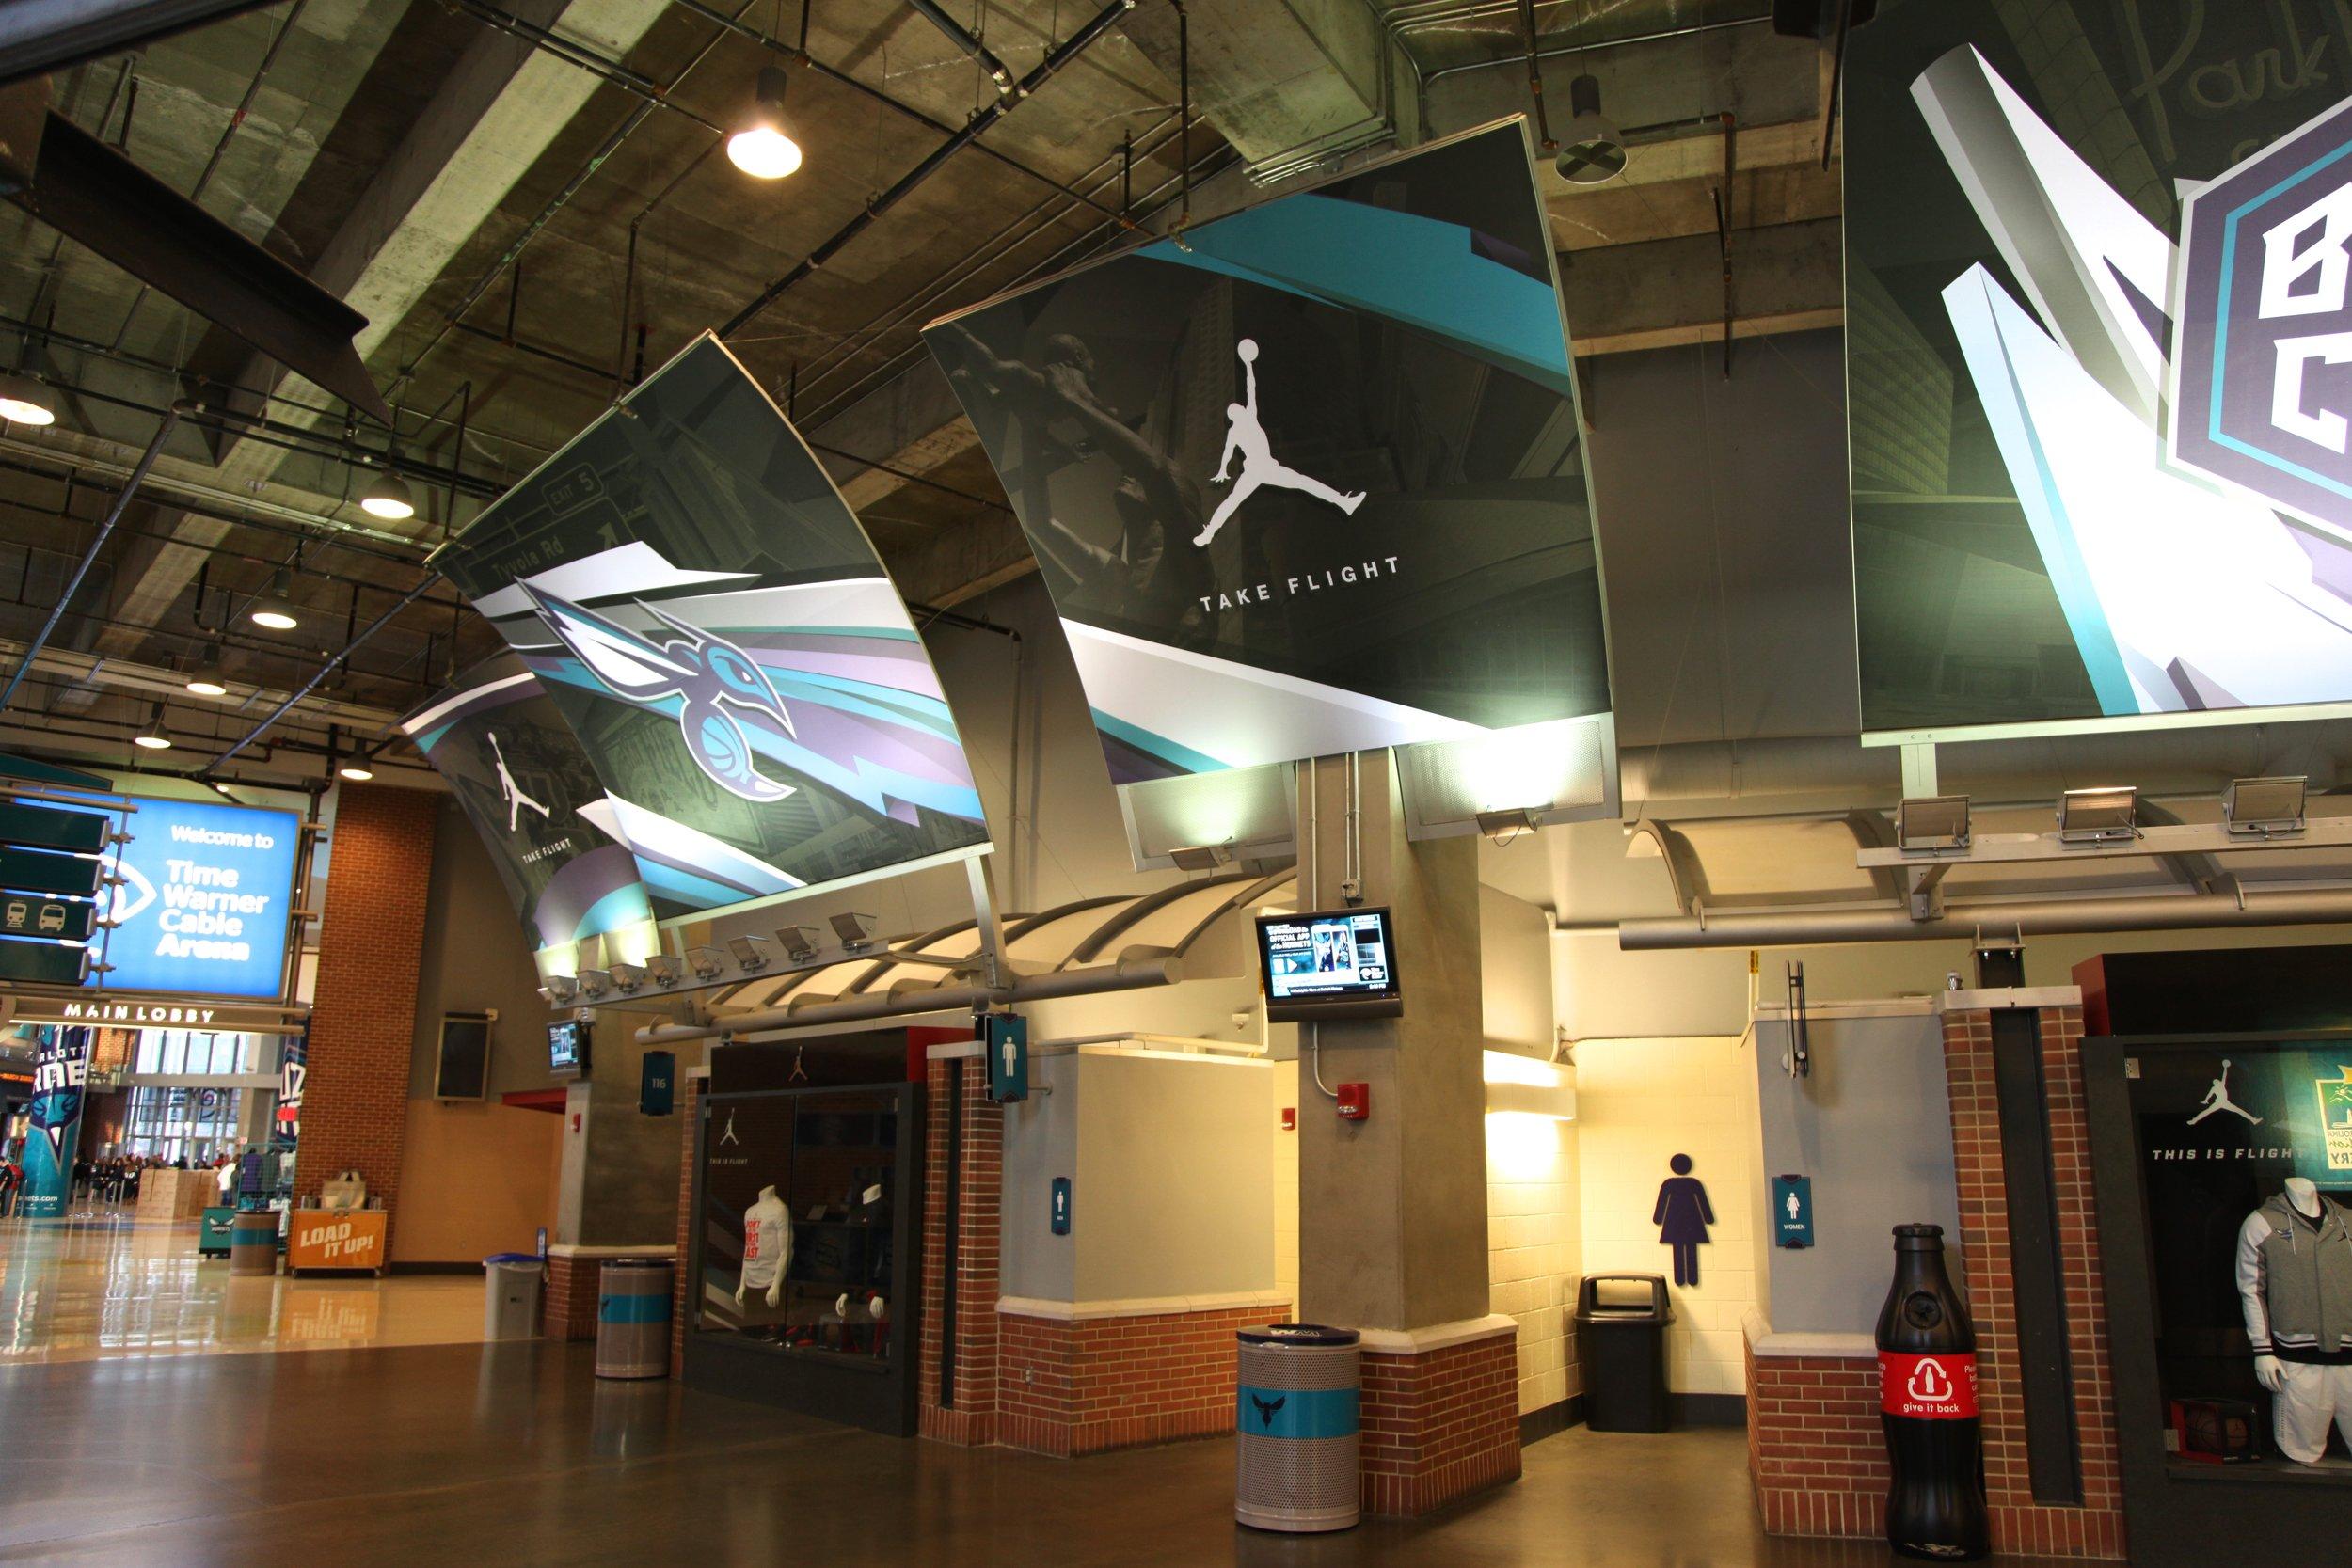 Hornets Curved Ceiling Mount.JPG